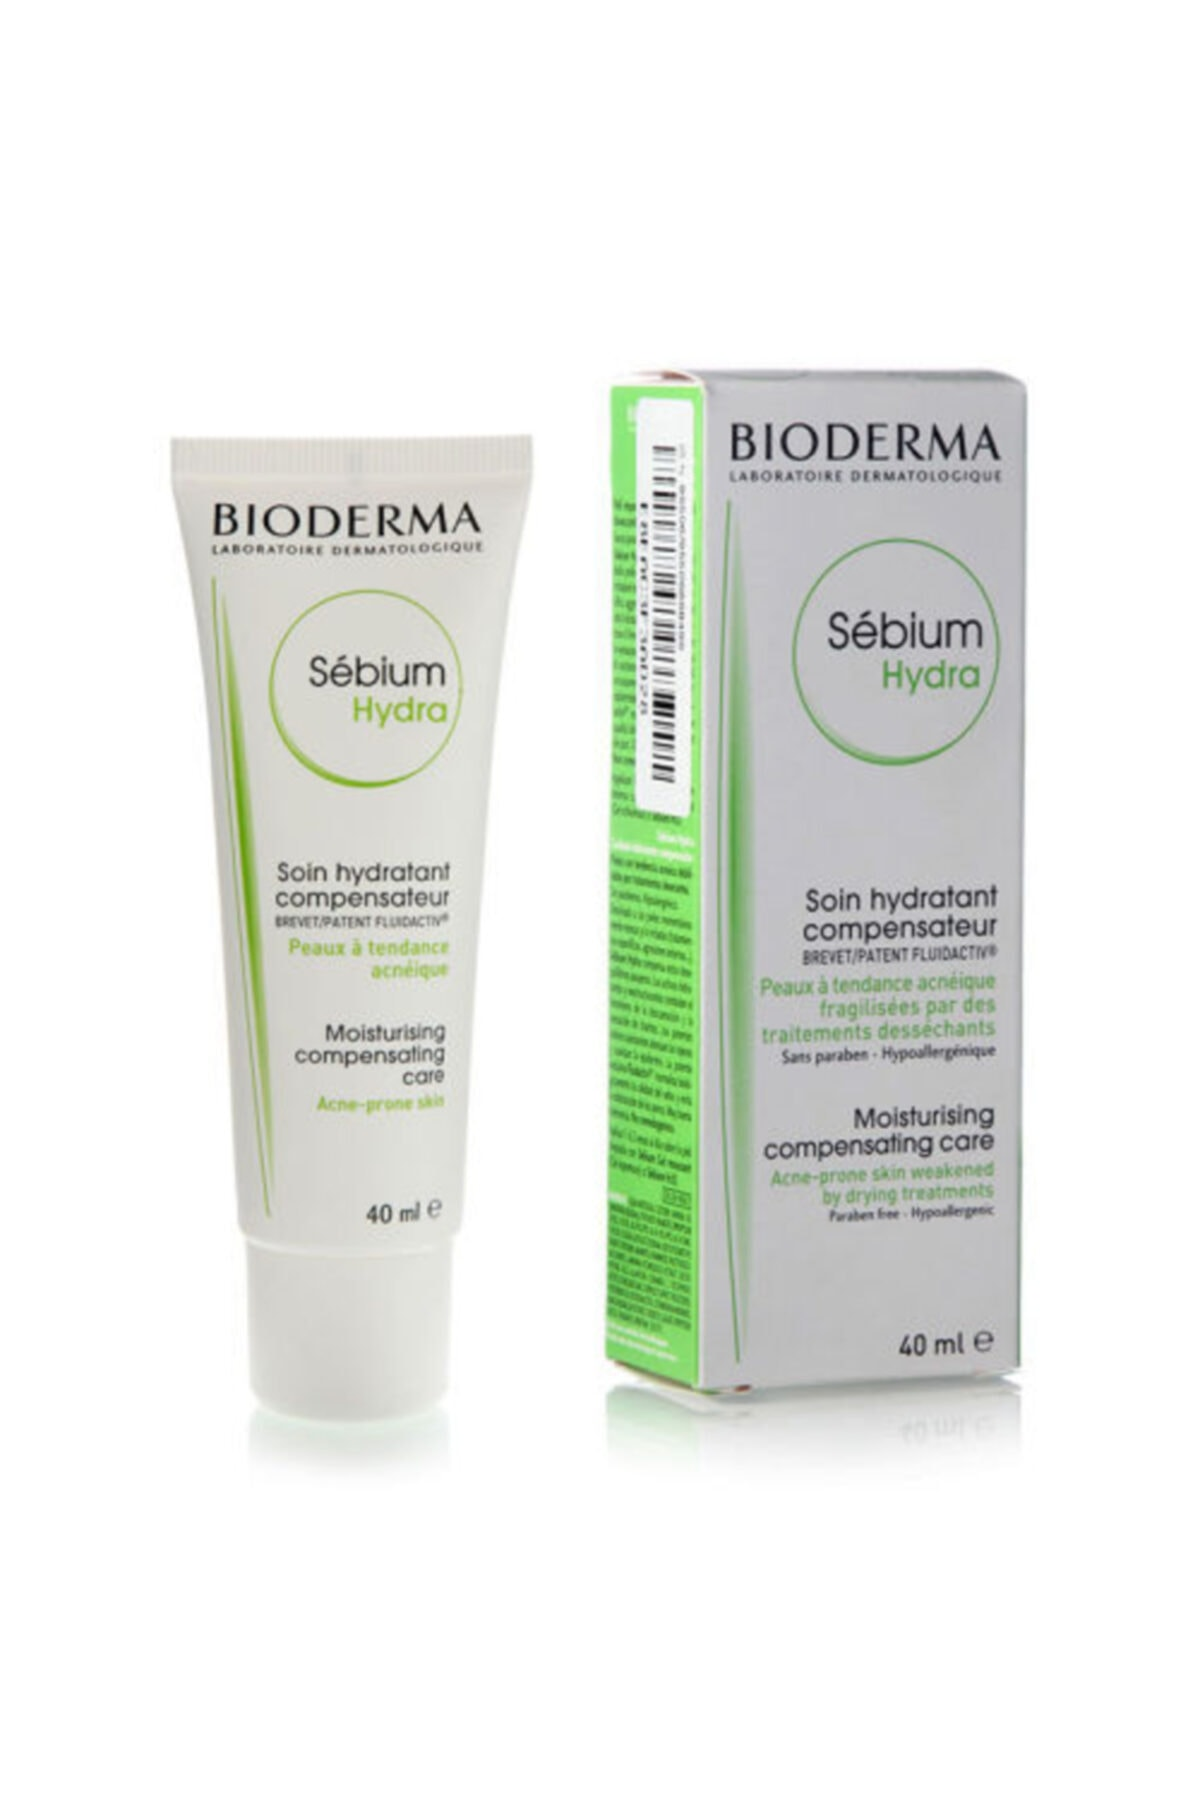 Bioderma Sebium Hydra Cream 40ml 1